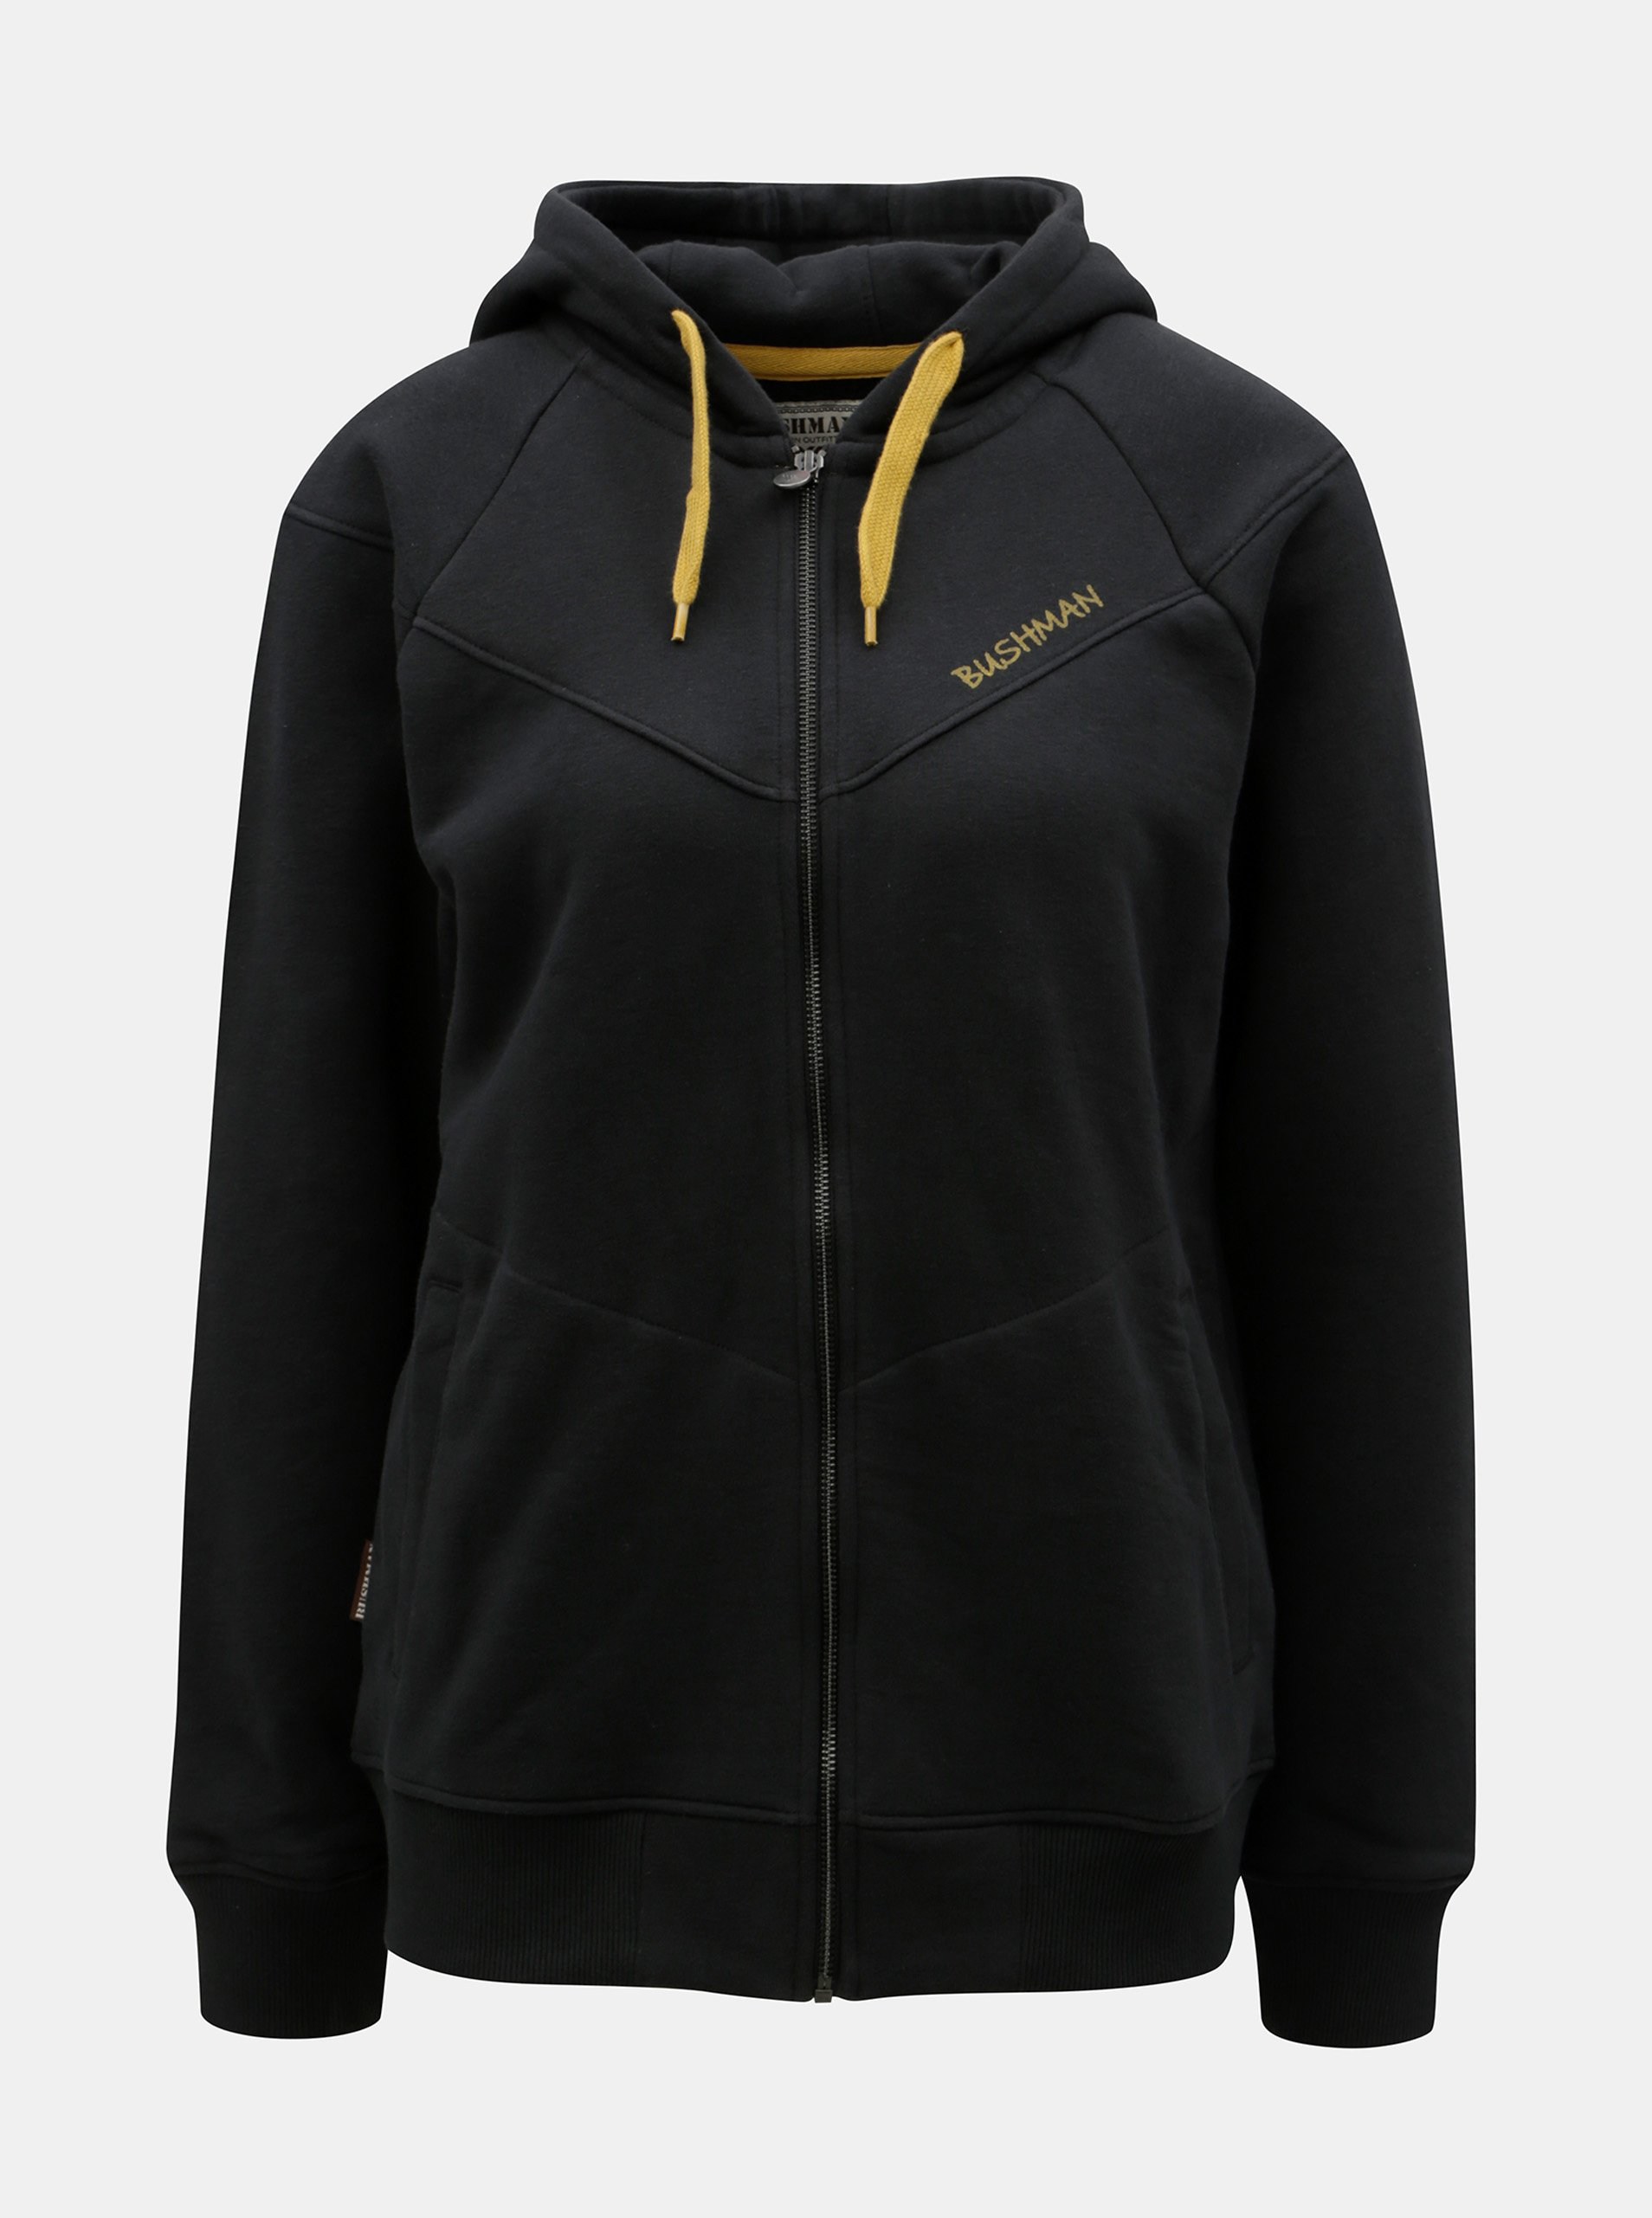 Černá dámská mikina na zip BUSHMAN Skokie 40fc6205b9